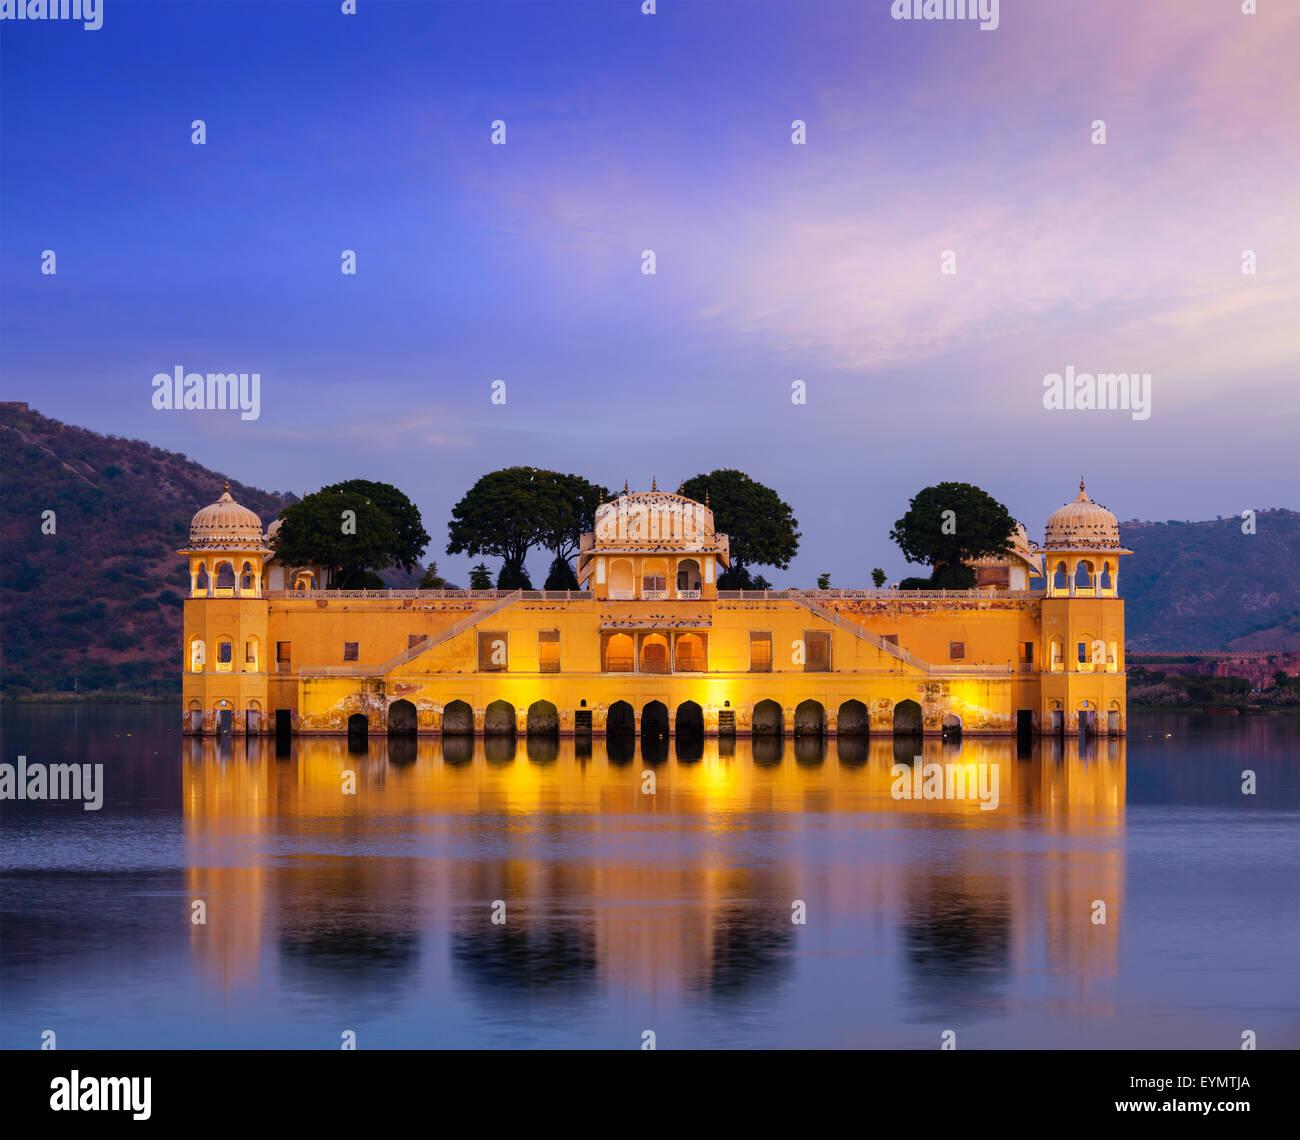 Rajasthan landmark - Jal Mahal Palace acqua sull'uomo Sagar lago la sera nel crepuscolo. Jaipur, Rajasthan, Immagini Stock